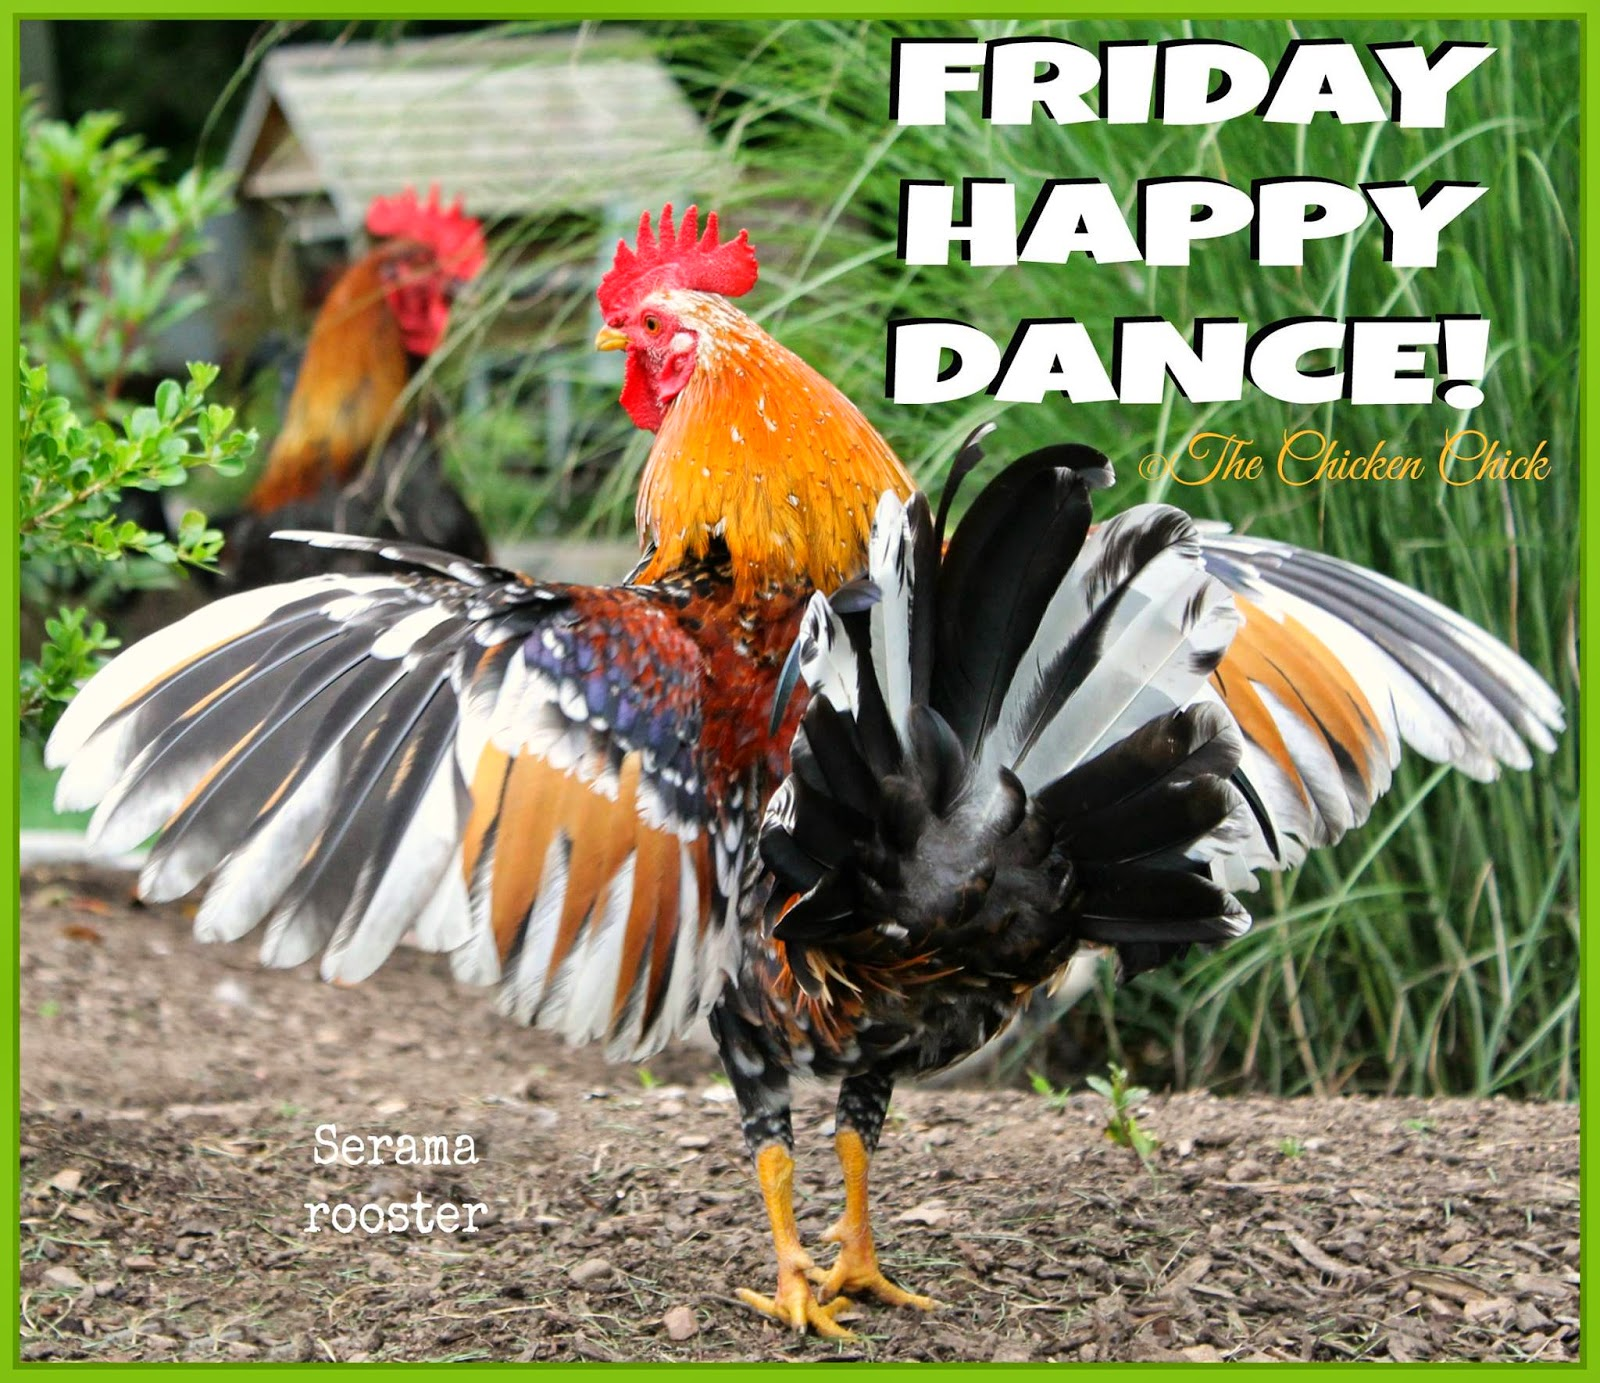 Friday Happy Dance